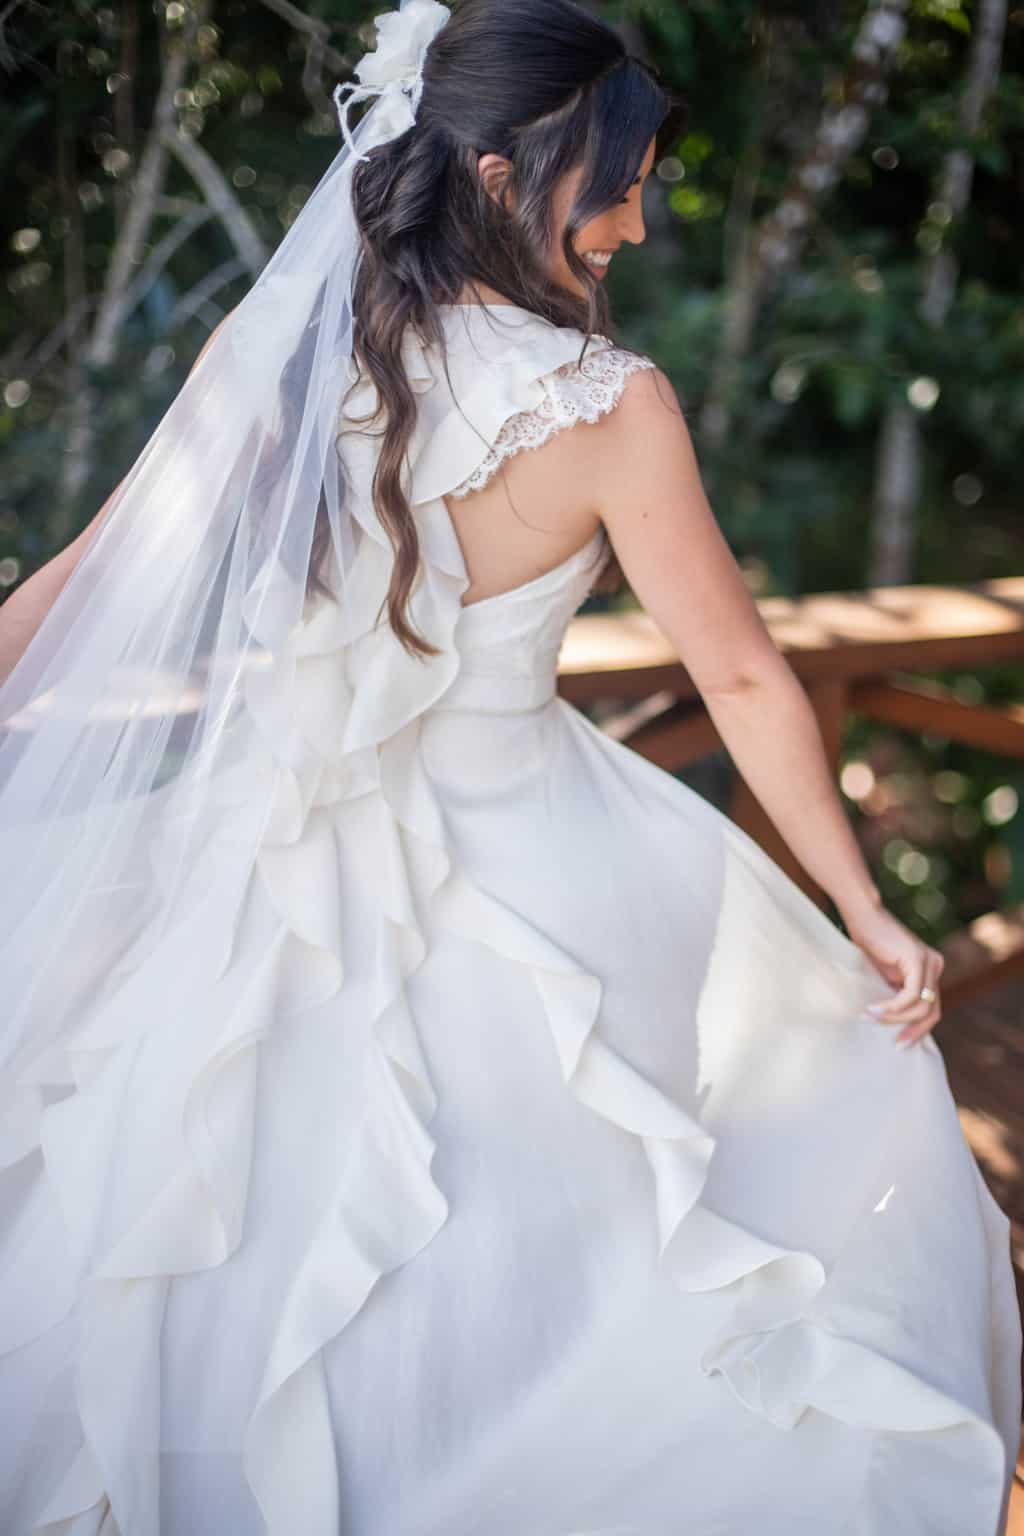 beleza-da-noiva-Casamento-Juliana-e-Sebastian-making-of-Pousada-La-Belle-Bruna-vestido-de-noiva109